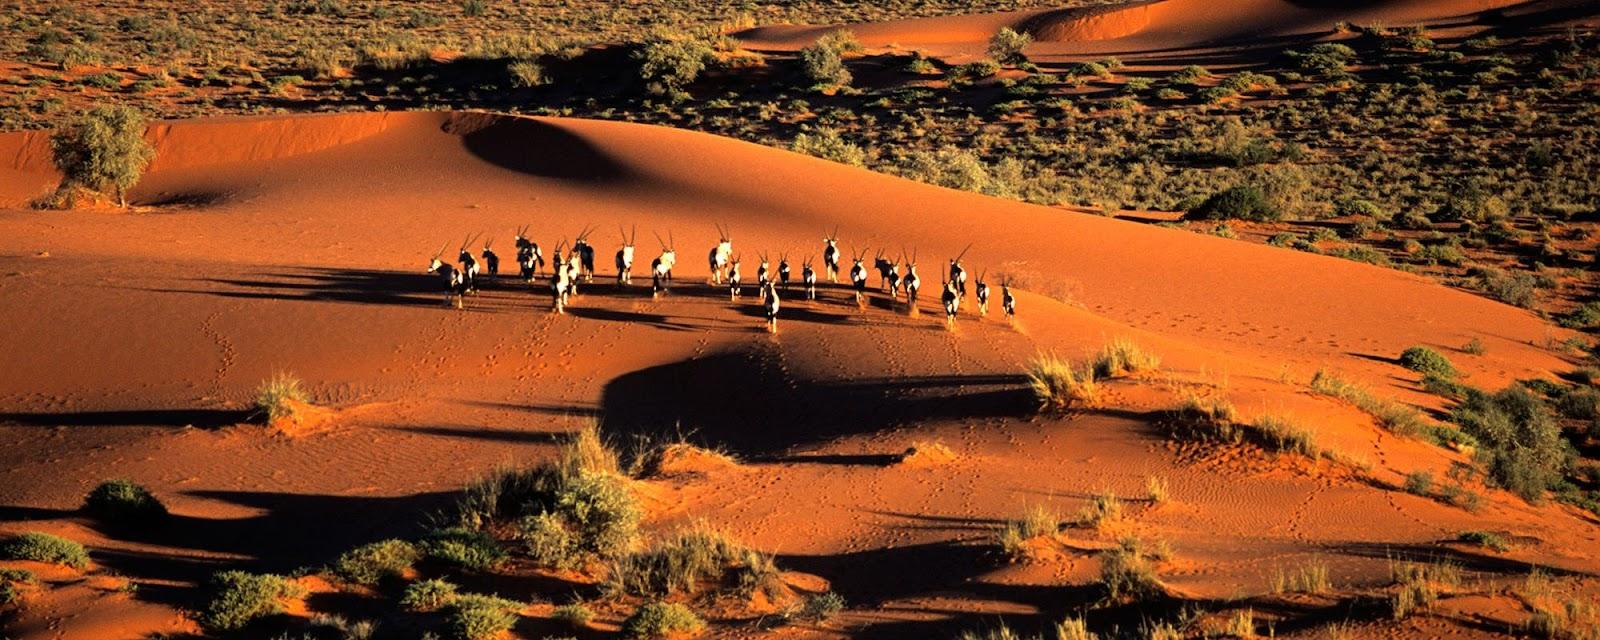 Kalahari Botwana - TCS world travel.jpg